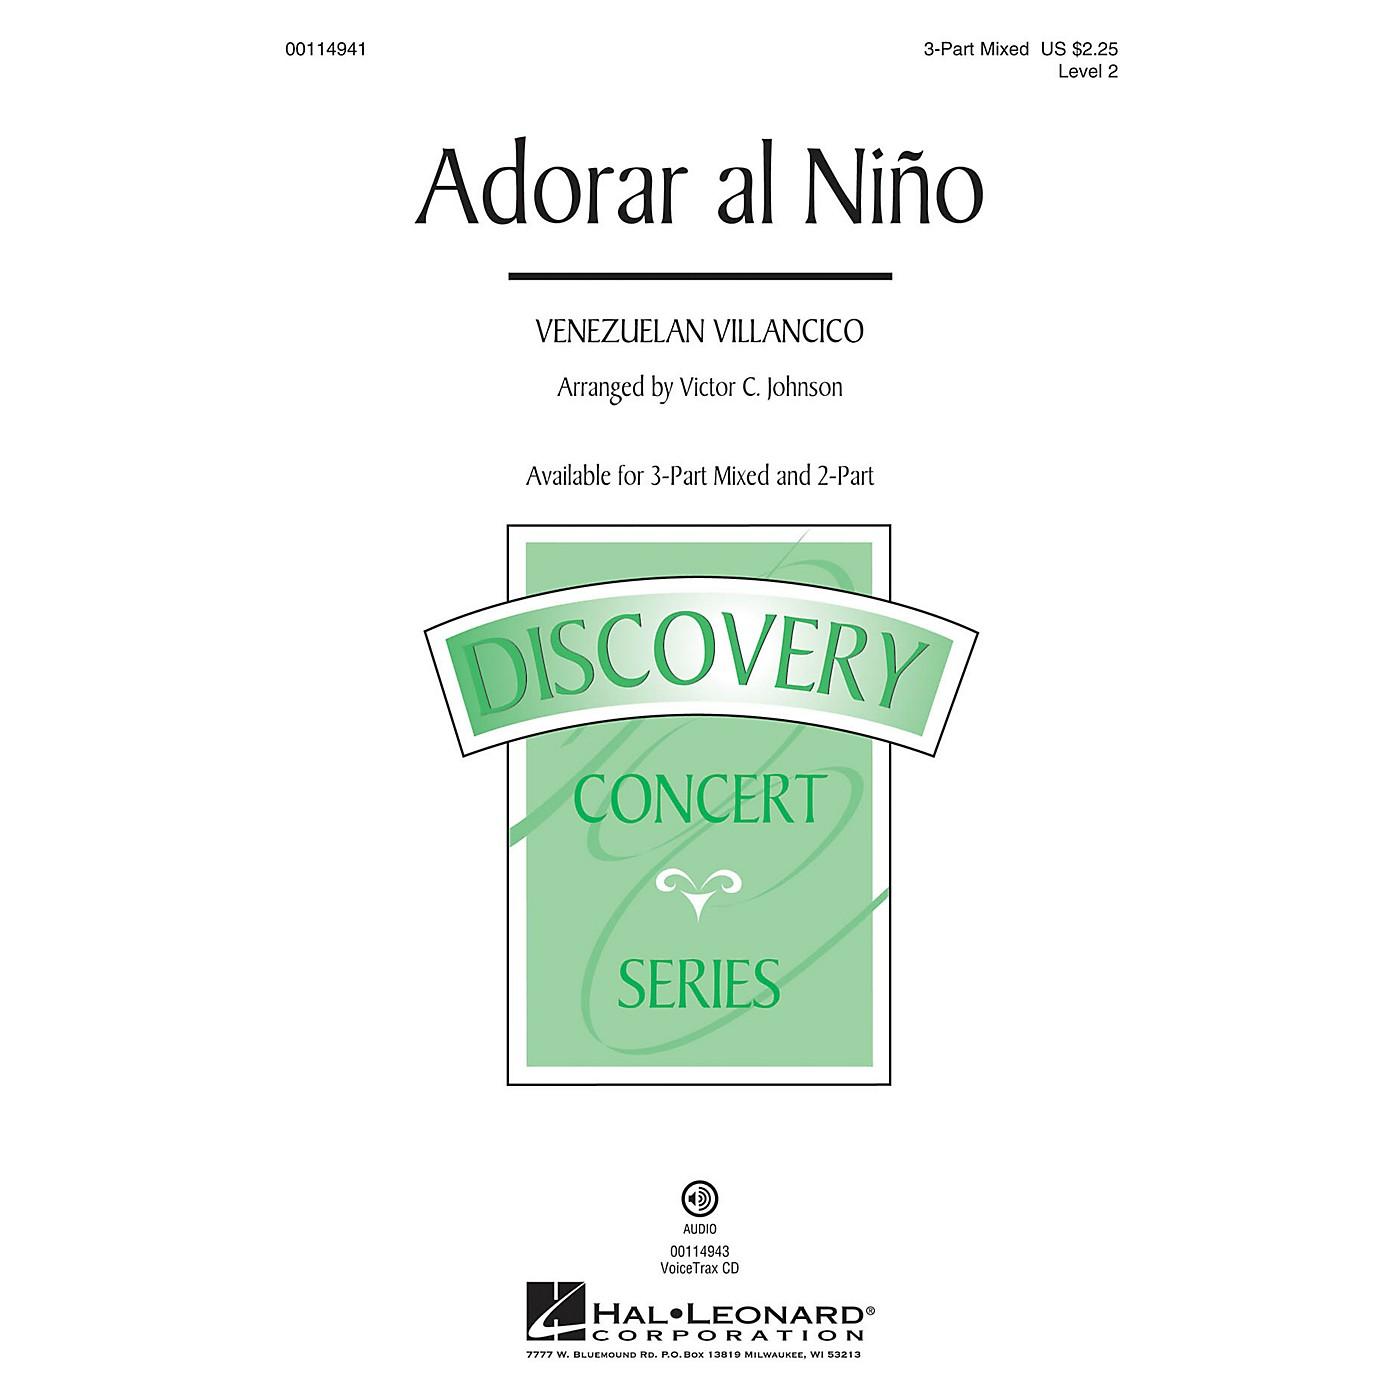 Hal Leonard Adorar al Niño (Discovery Level 2) 3-Part Mixed arranged by Victor Johnson thumbnail